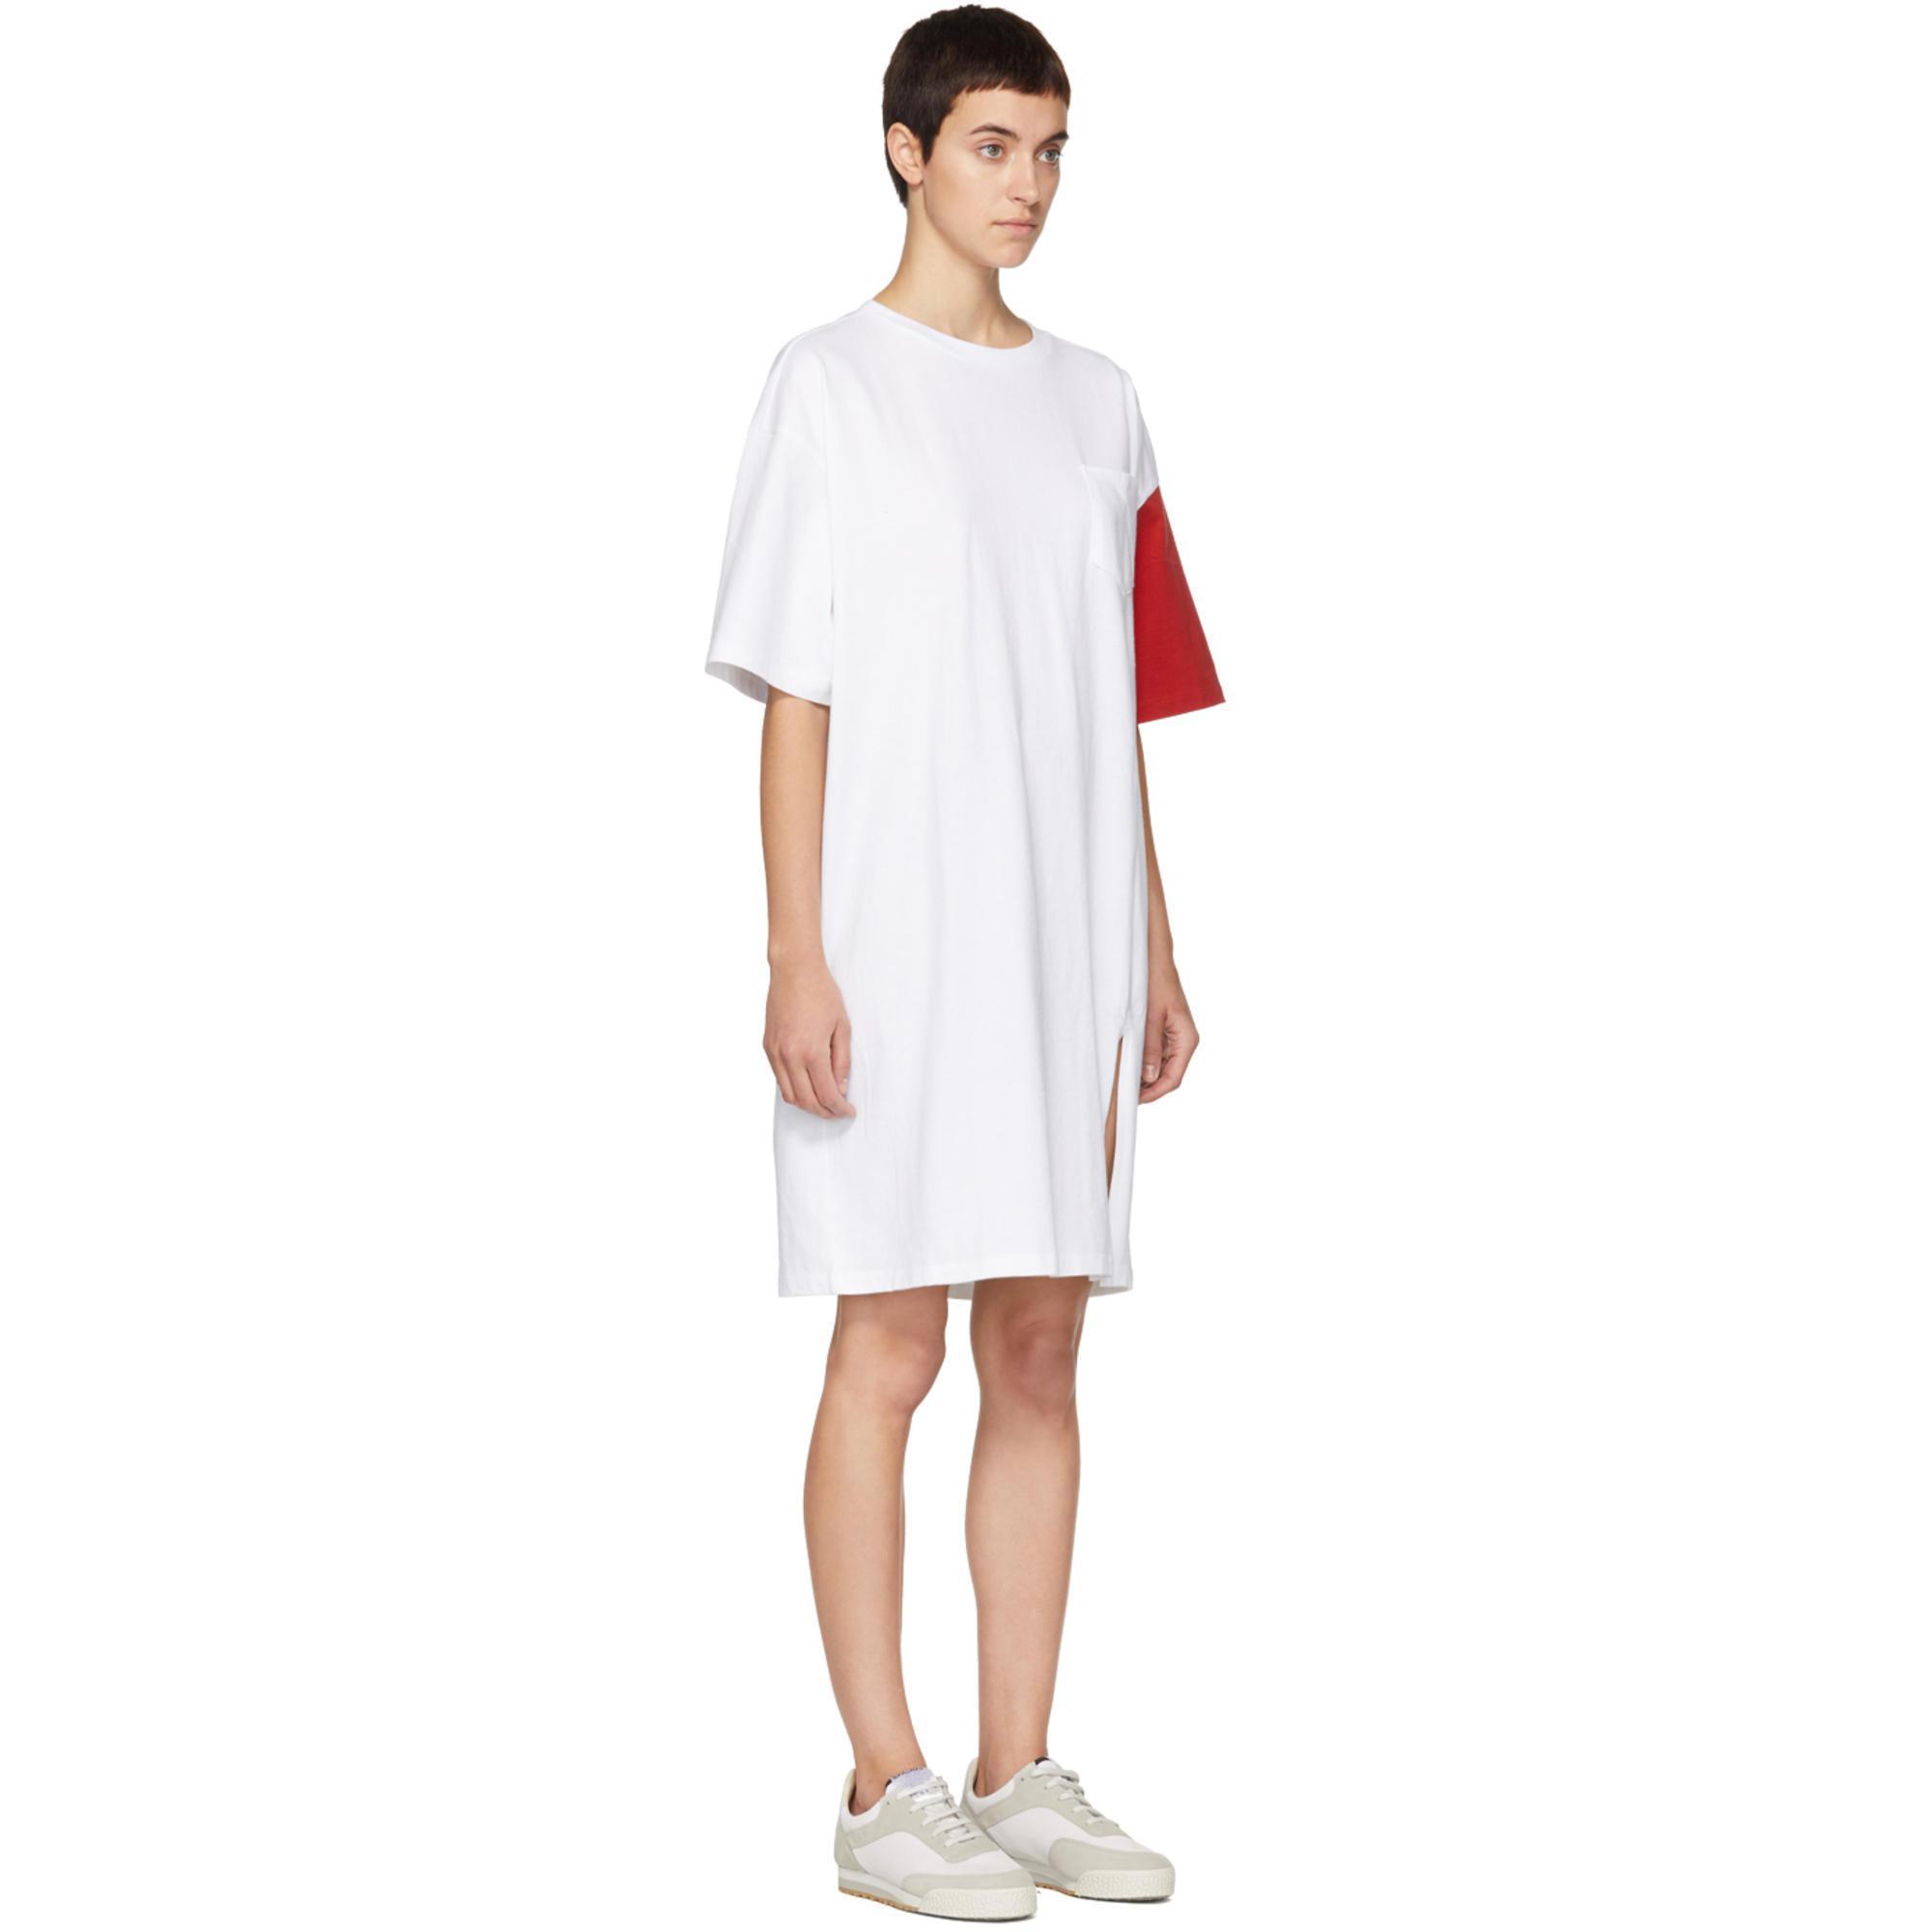 White and Red California Club T-Shirt Dress Sjyp iWQZxw